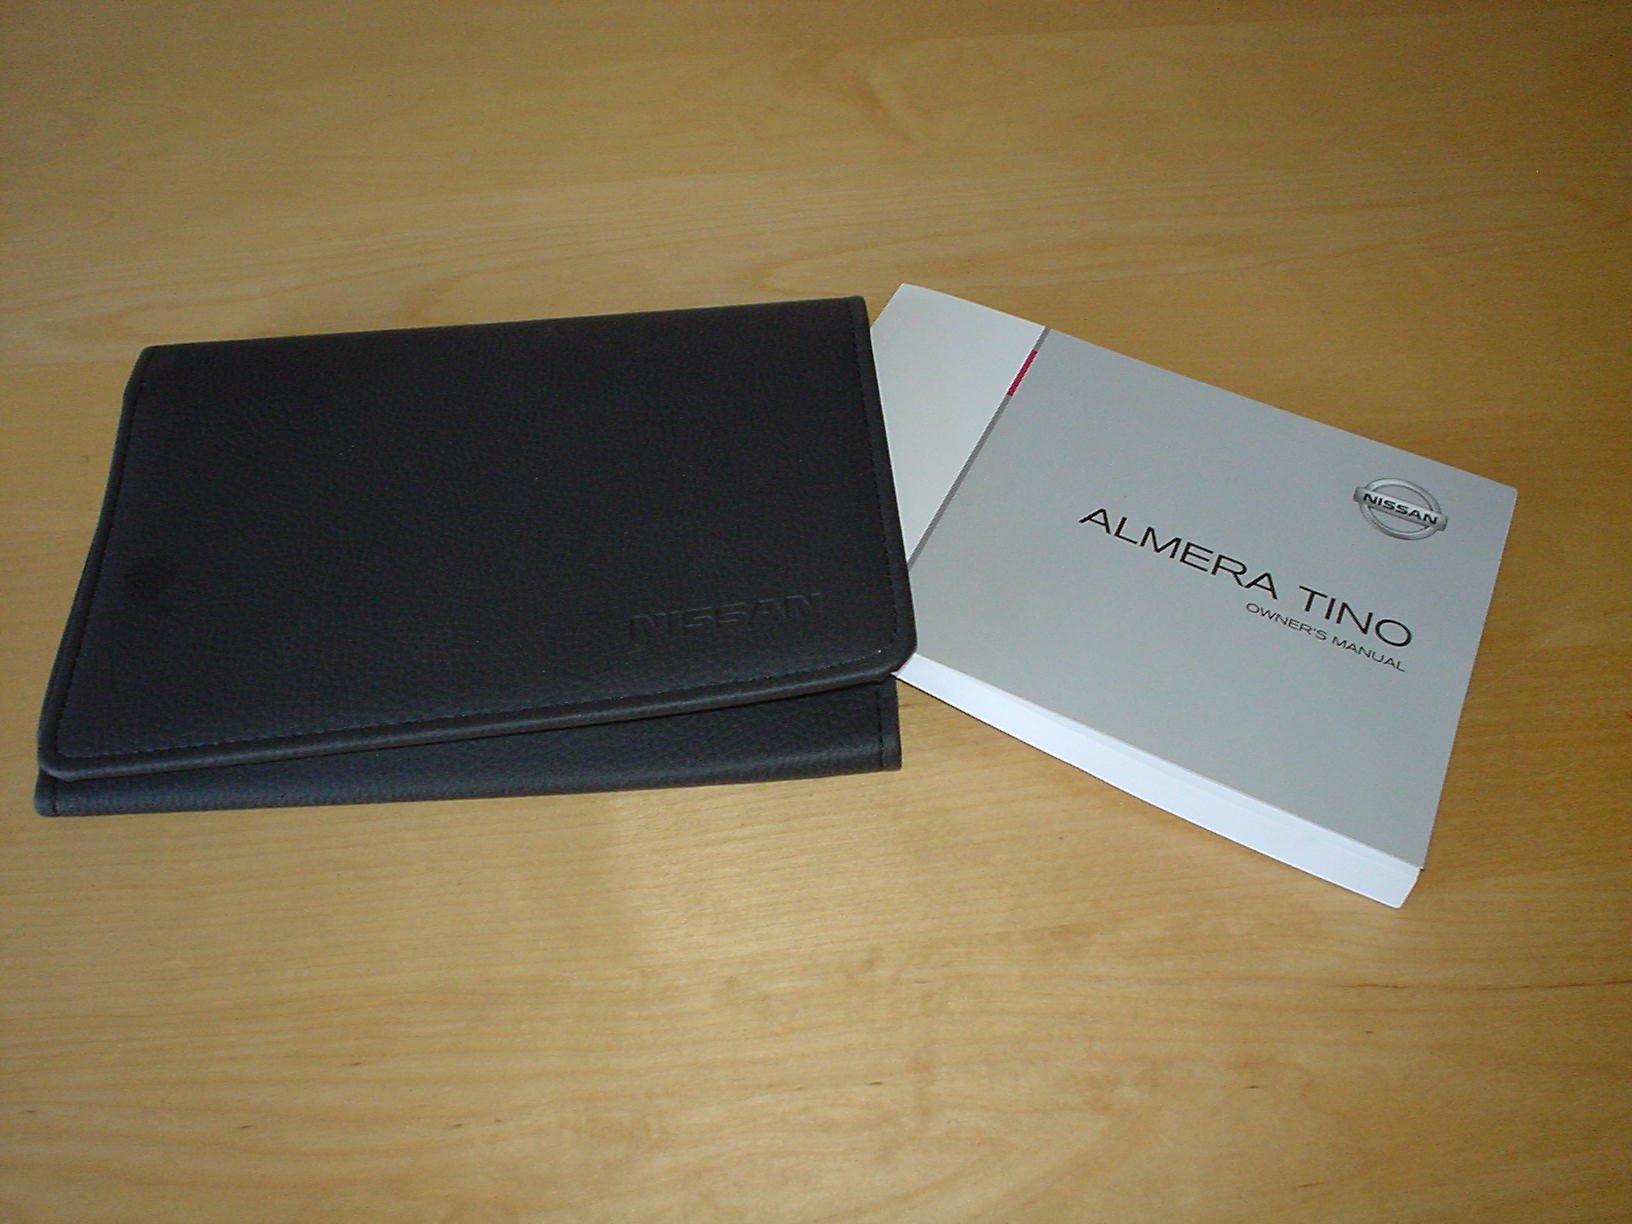 nissan almera tino owners manual handbook 2000 2006 1 8 2 0 rh amazon co uk 2000 Nissan Sentra 2000 Nissan Sentra